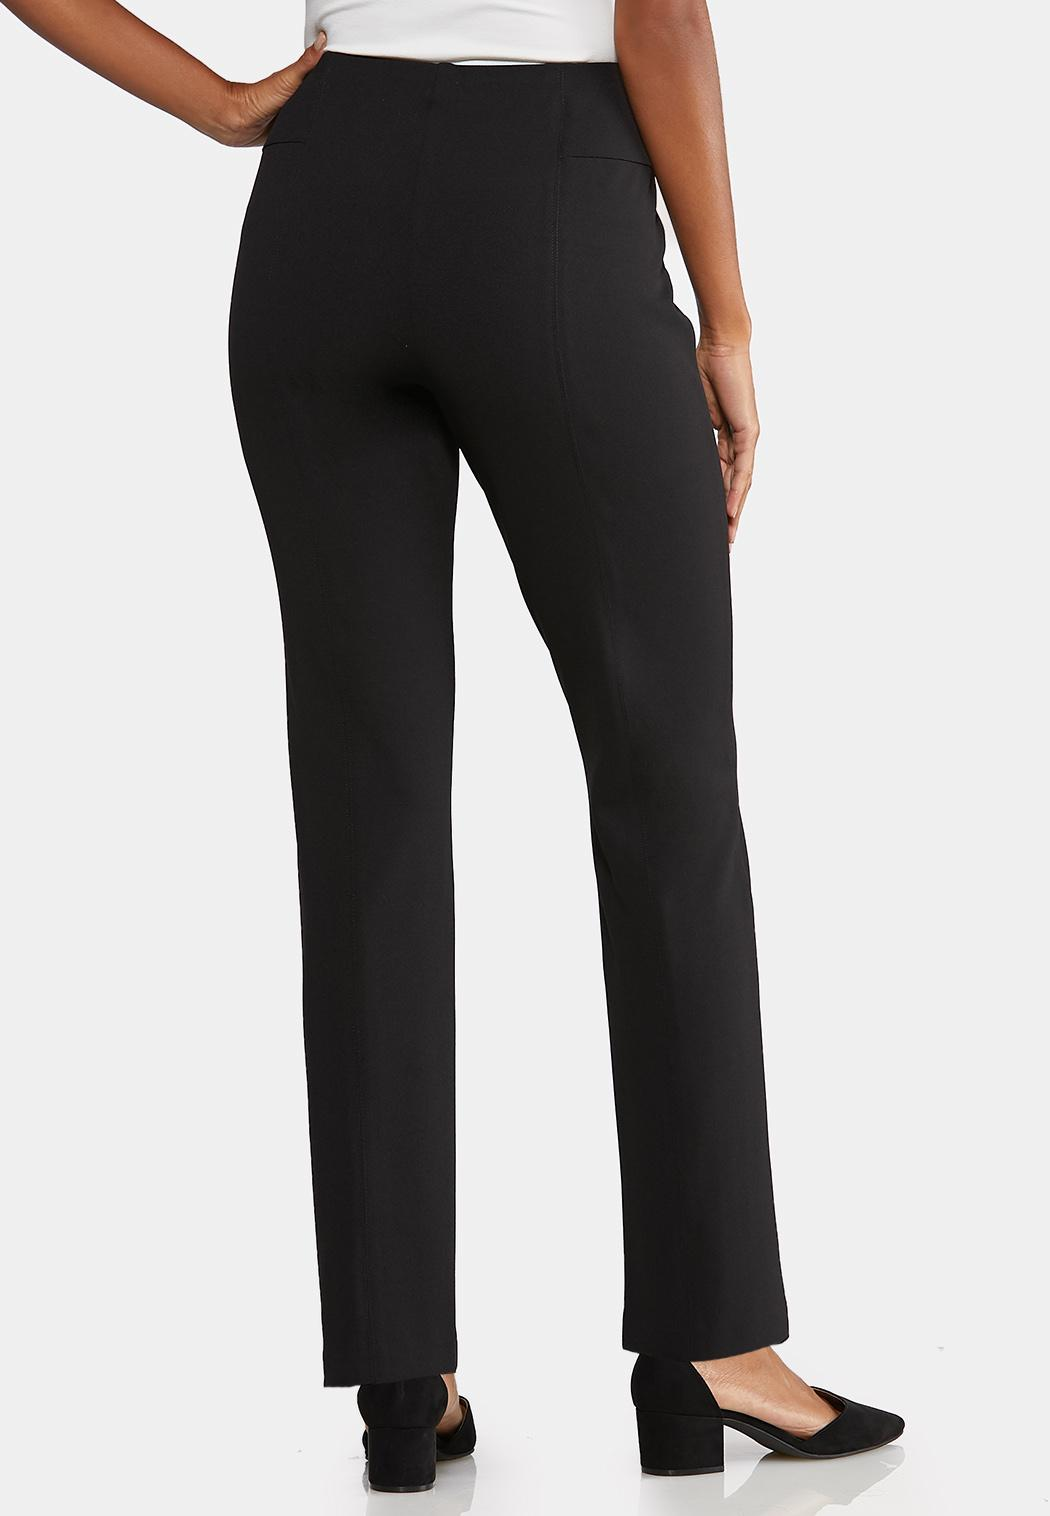 Petite Twill Straight Leg Pants (Item #43956203)